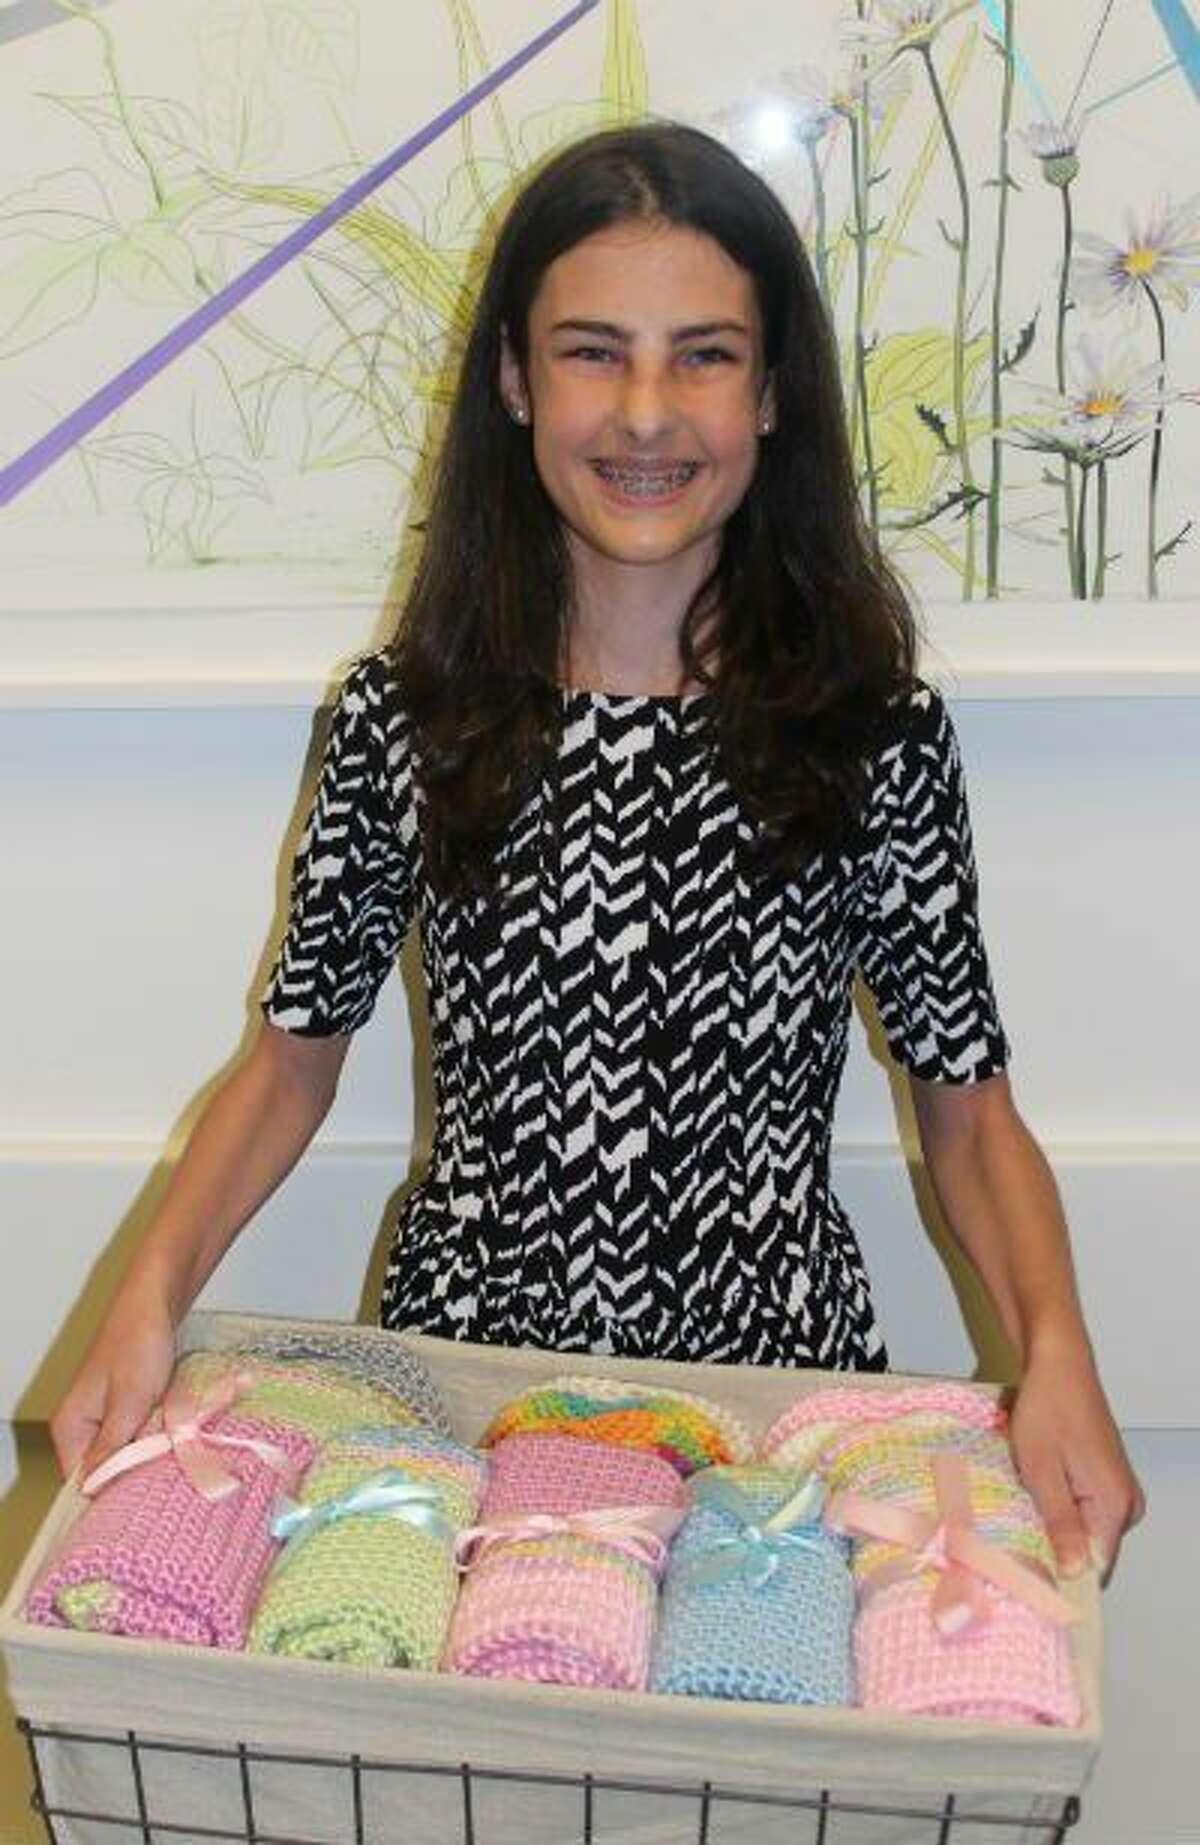 Former NICU patient Hannah Fox, 13, delivers handmade blankets to Children's Memorial Hermann Hospital.